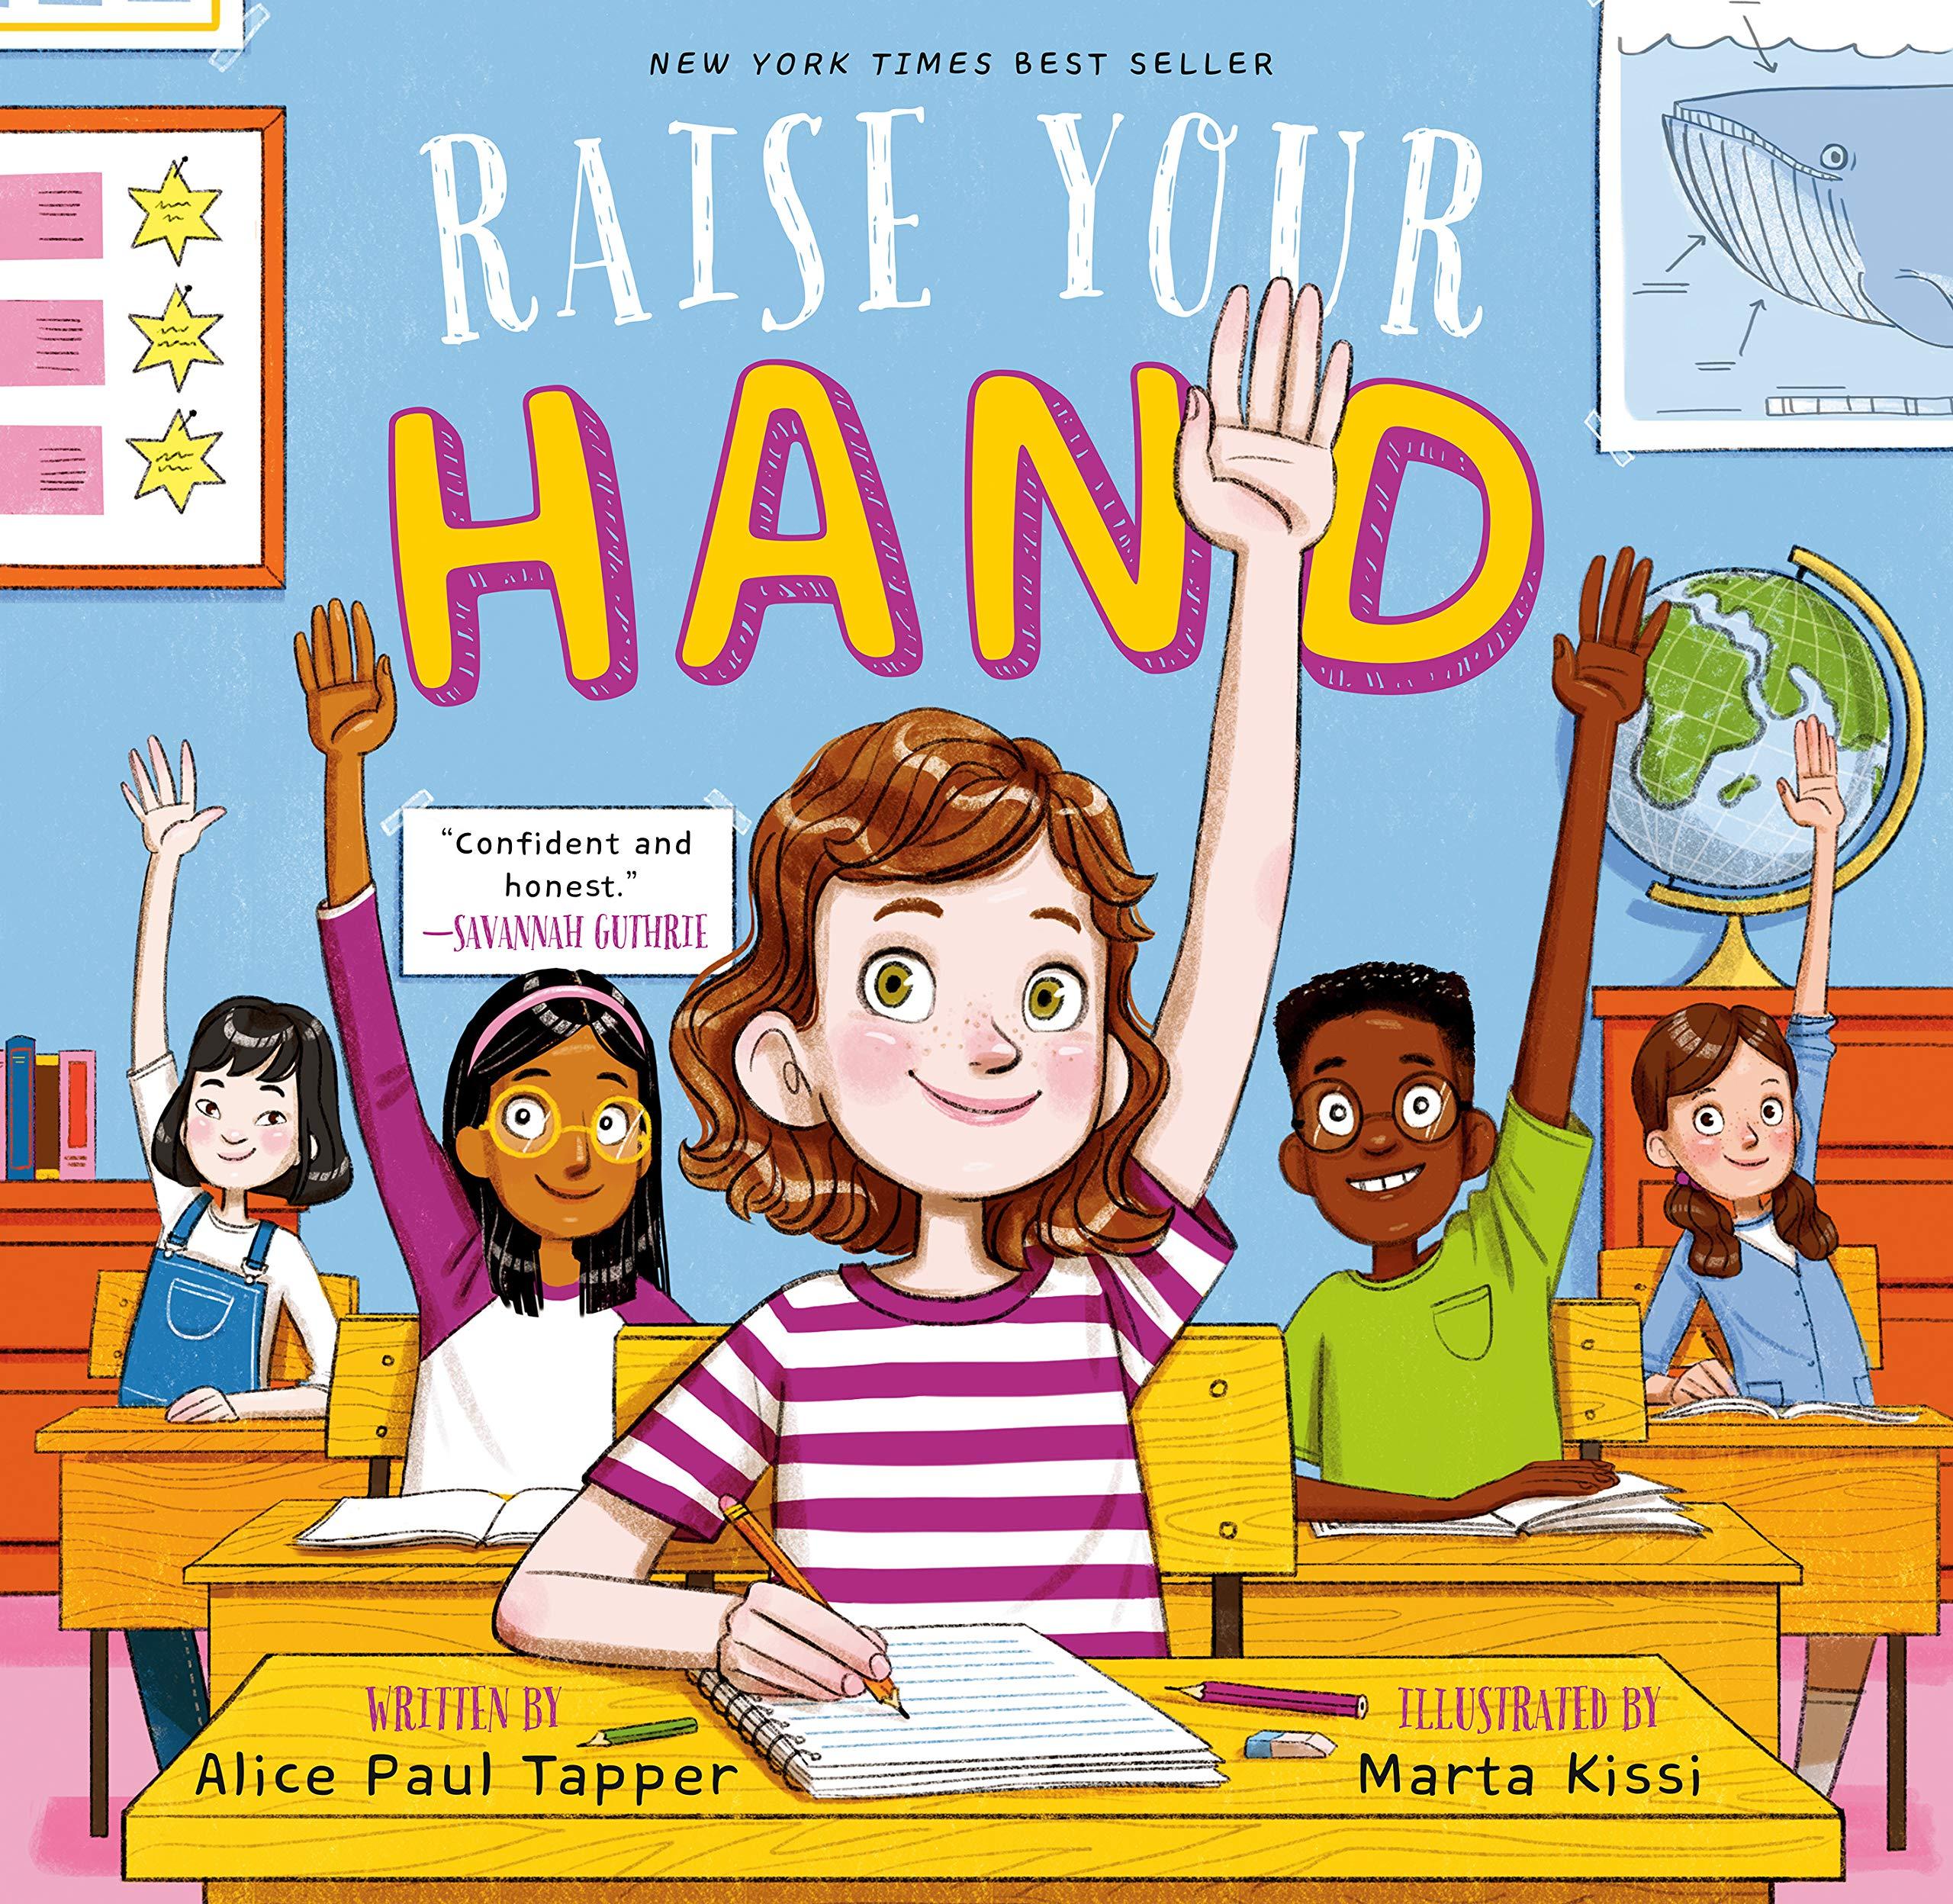 Raise Your Hand: Alice Paul Tapper, Marta Kissi.